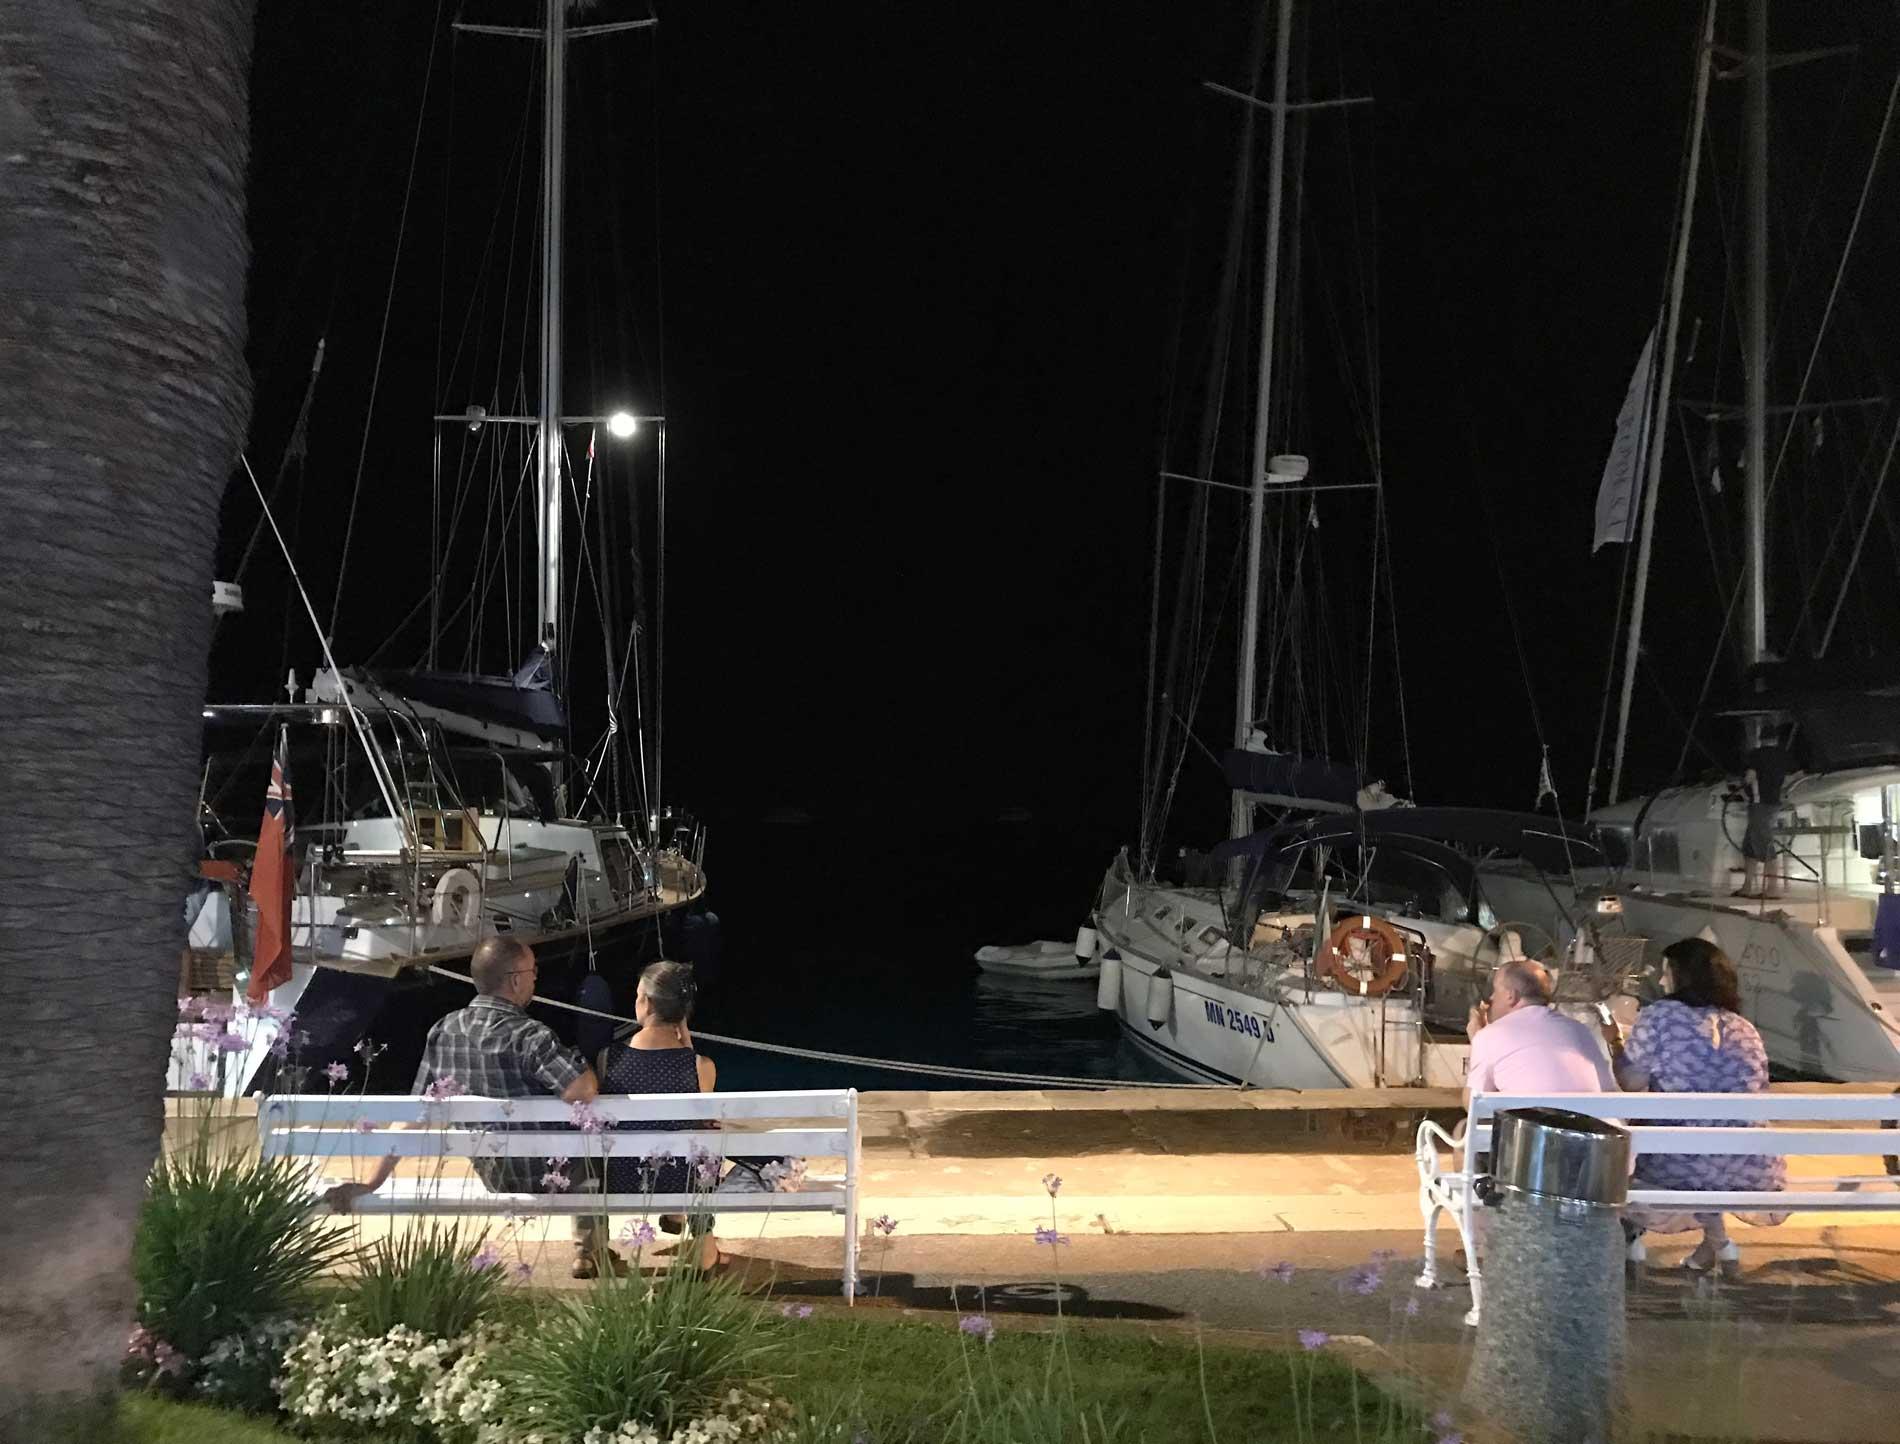 Cavtat-Dubrovnik-Croazia-barche-notte-buio-panchine